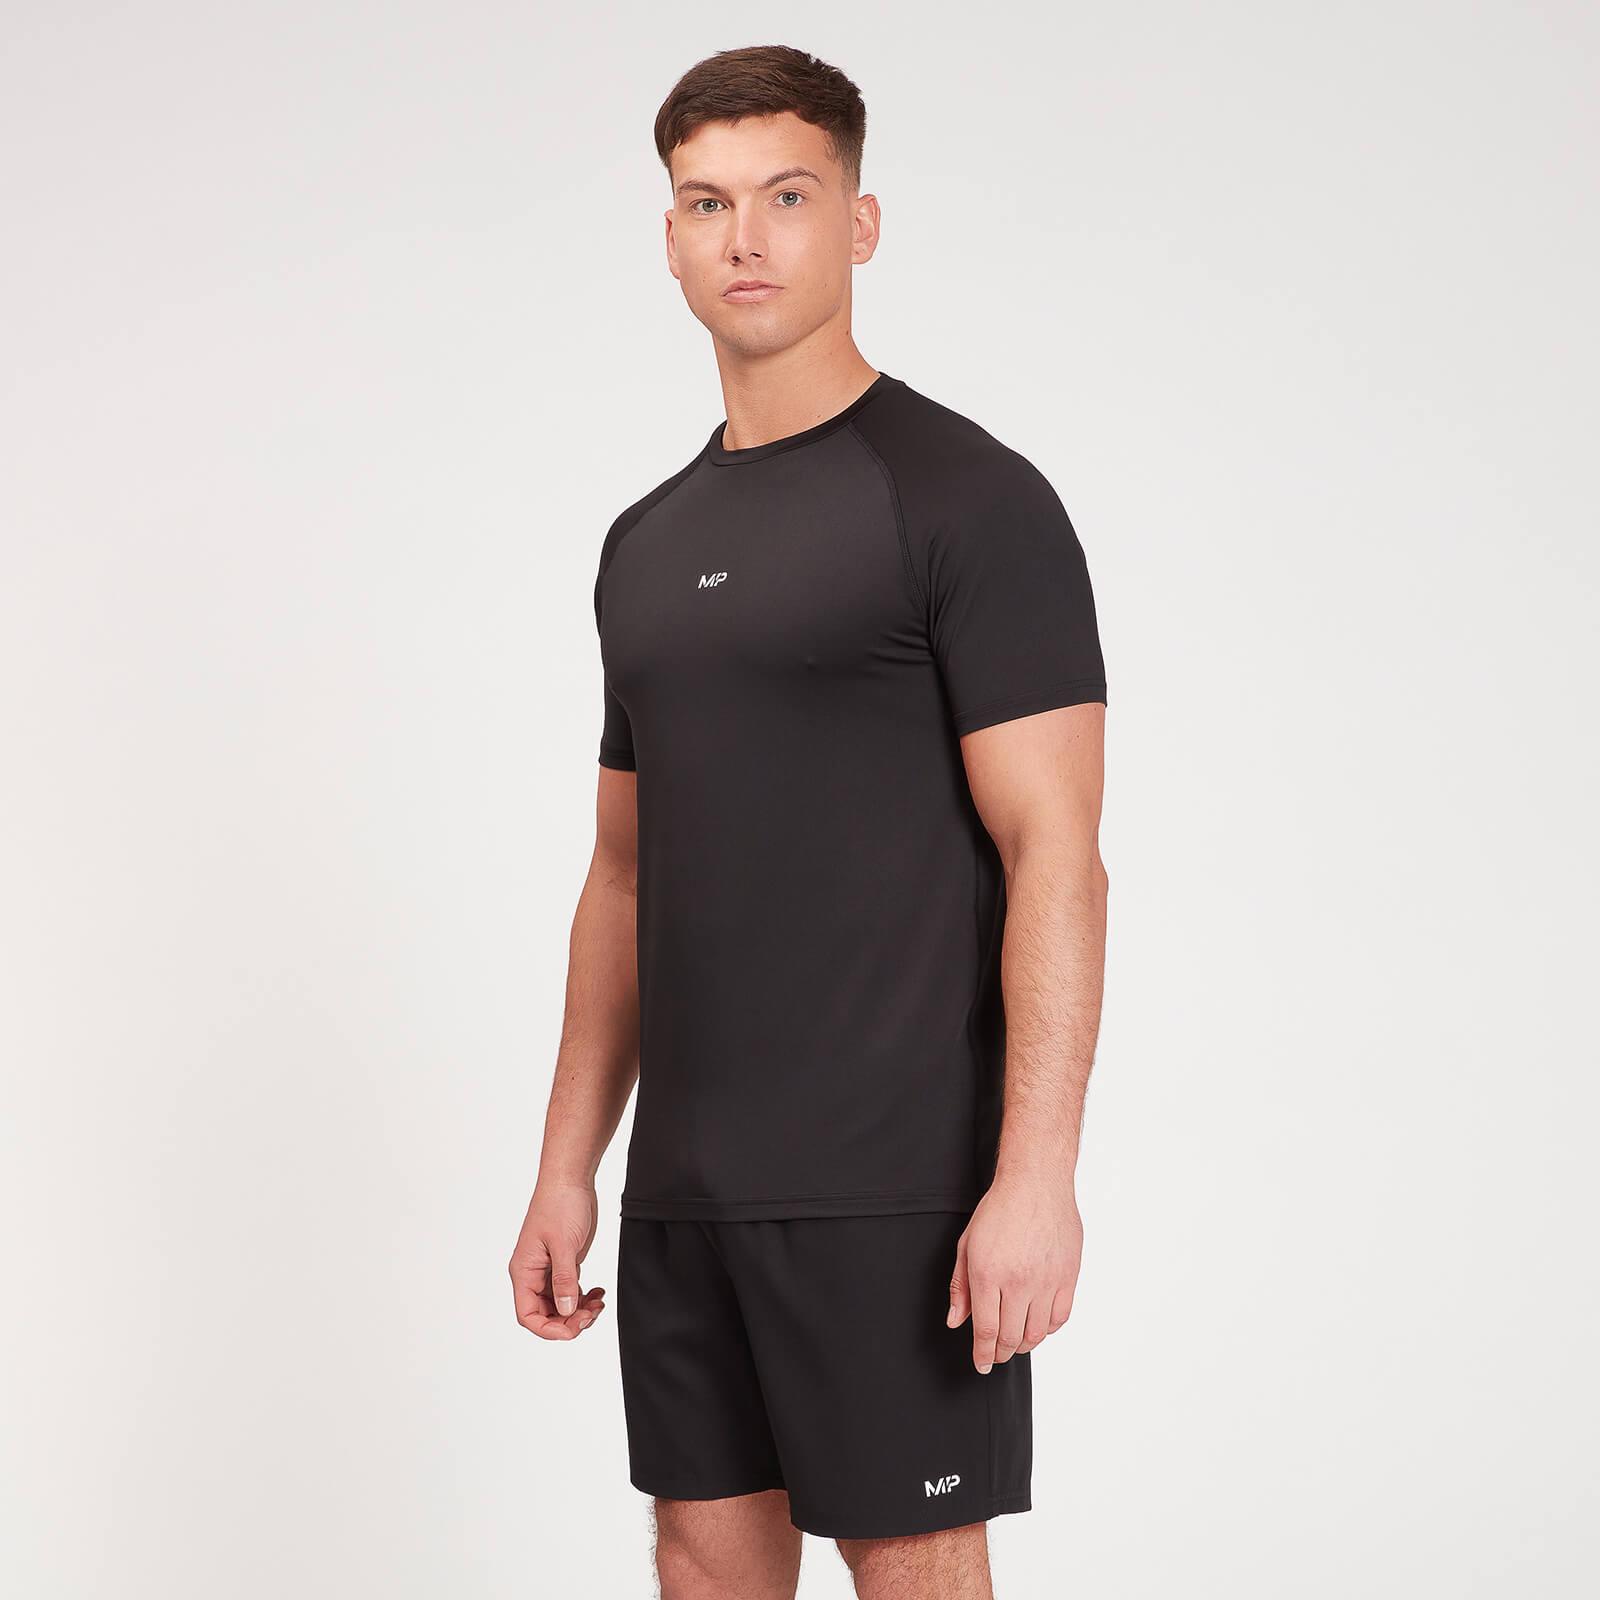 Купить Мужская футболка с короткими рукавами MP Graphiс Training - XL, Myprotein International